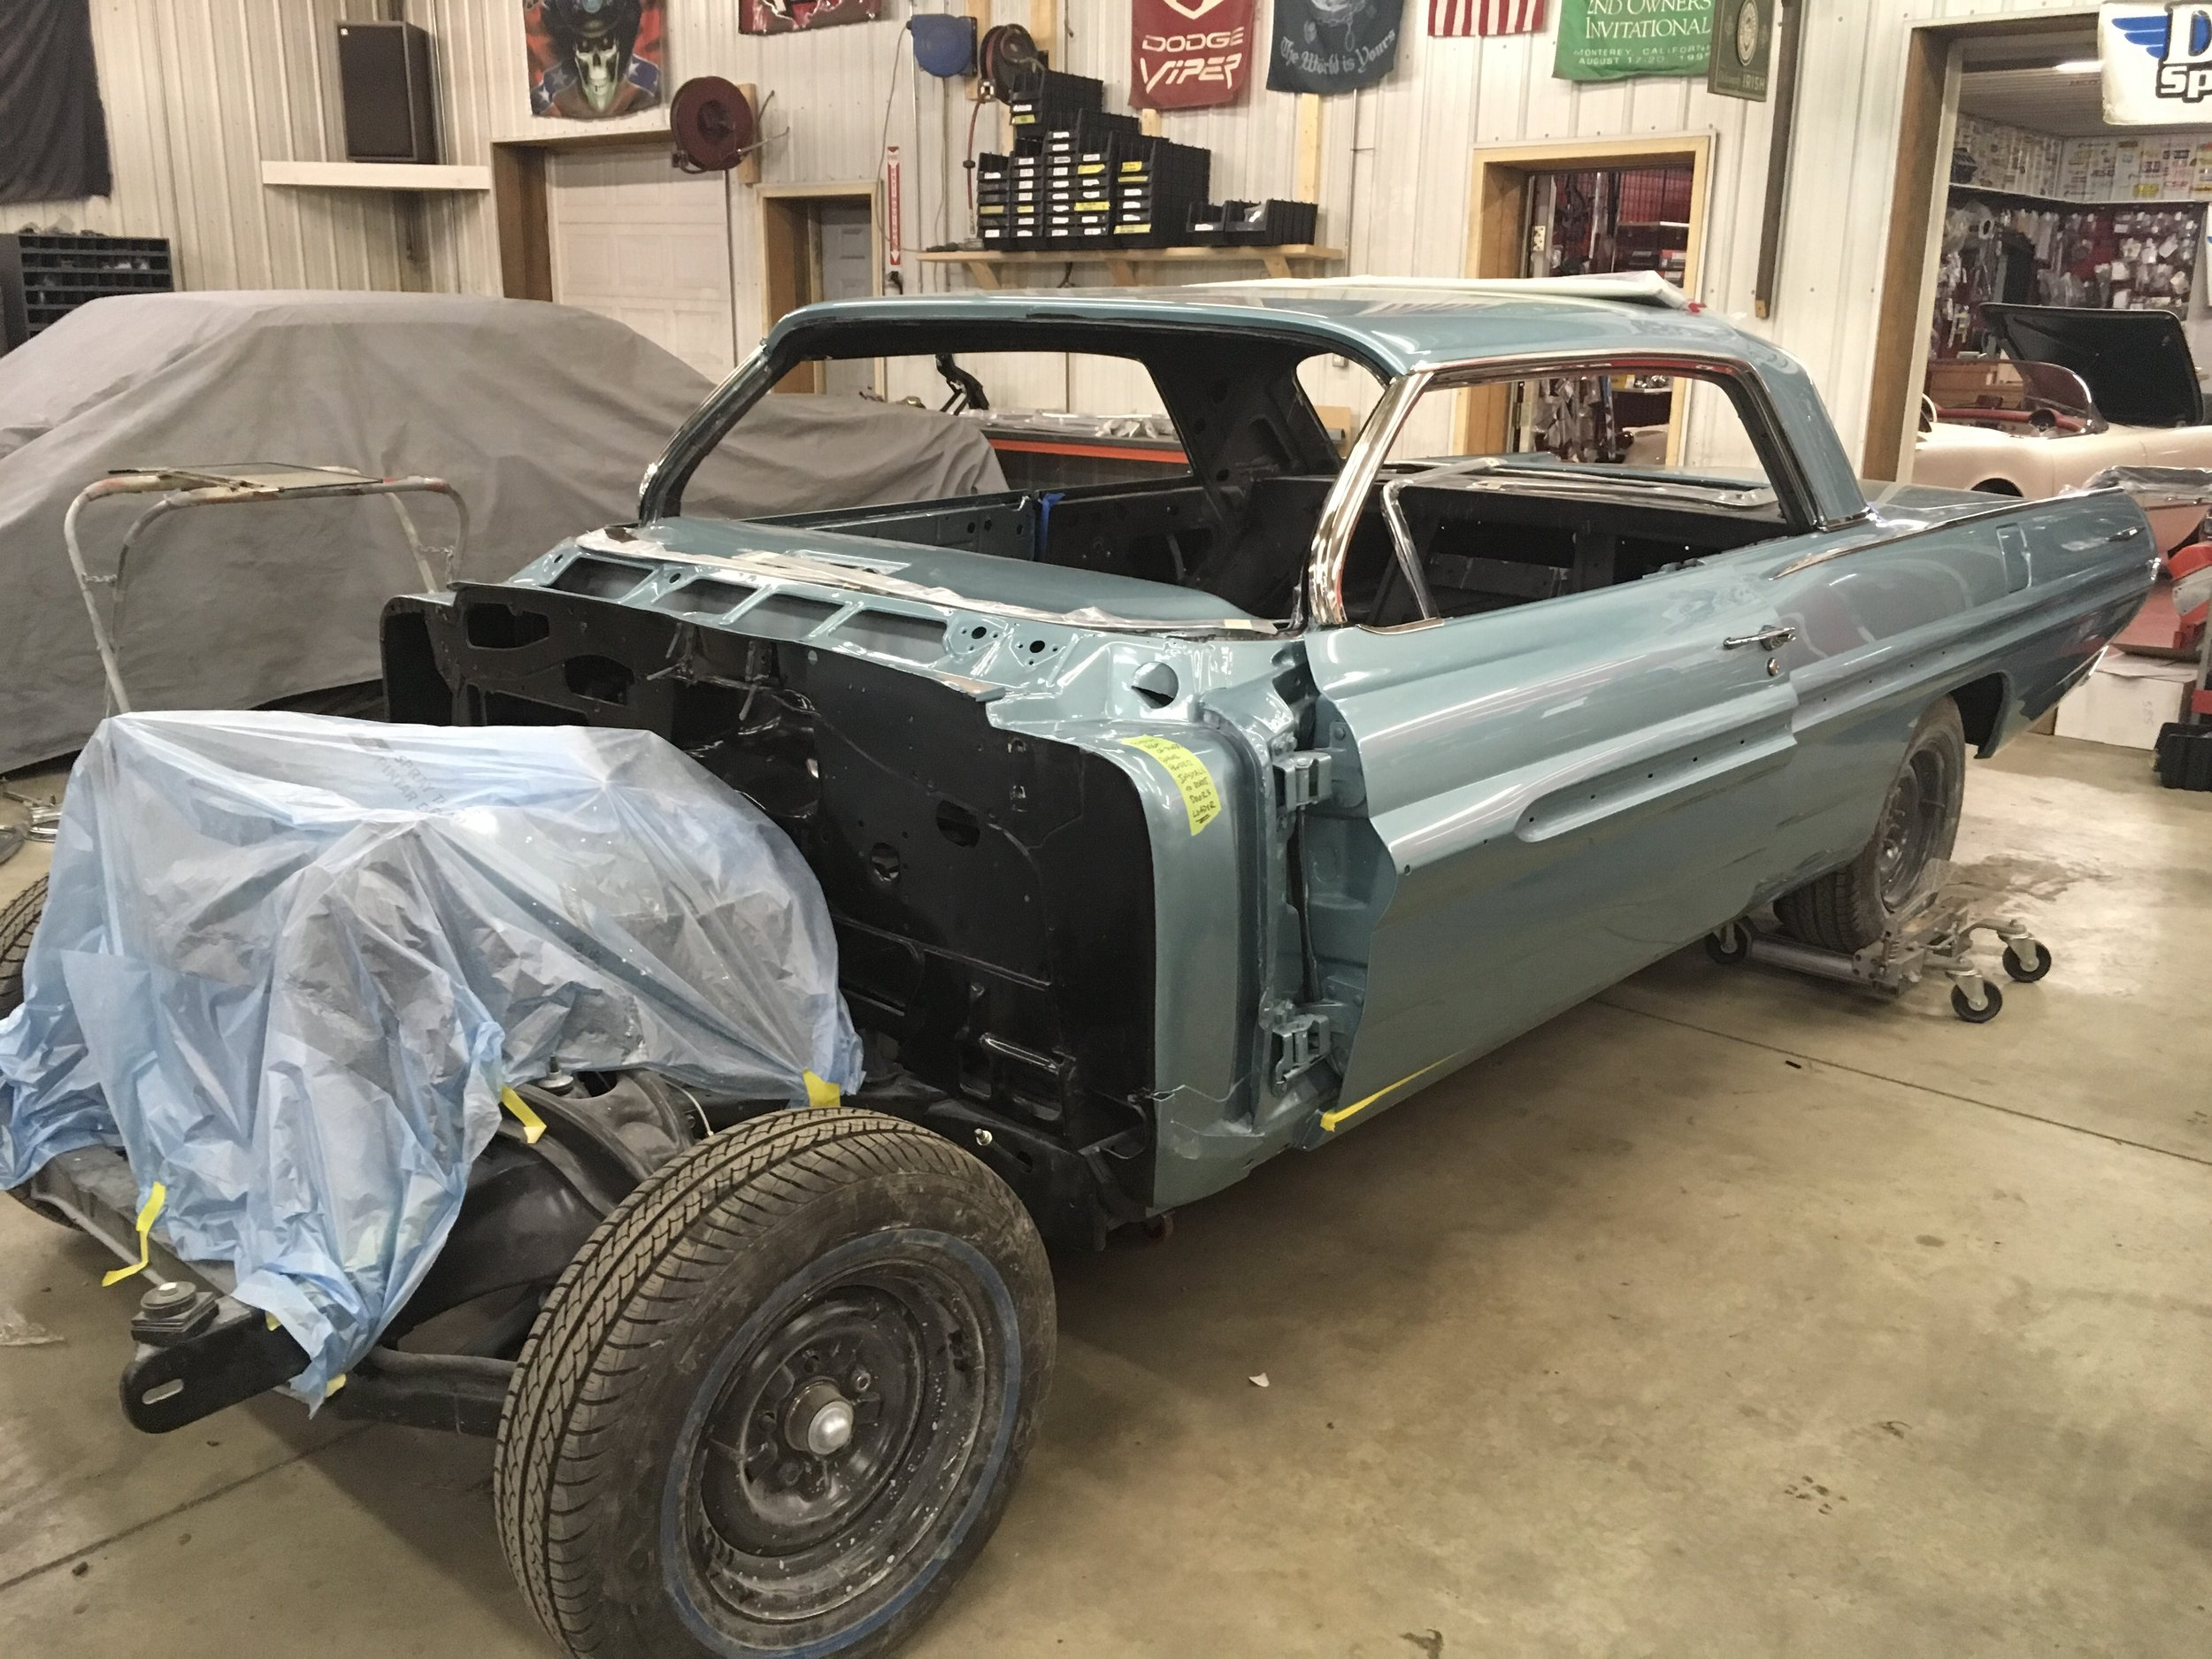 1962-pontiac-bonneville-minneapolis-hot-rod-custom-build-restoration-29.jpg